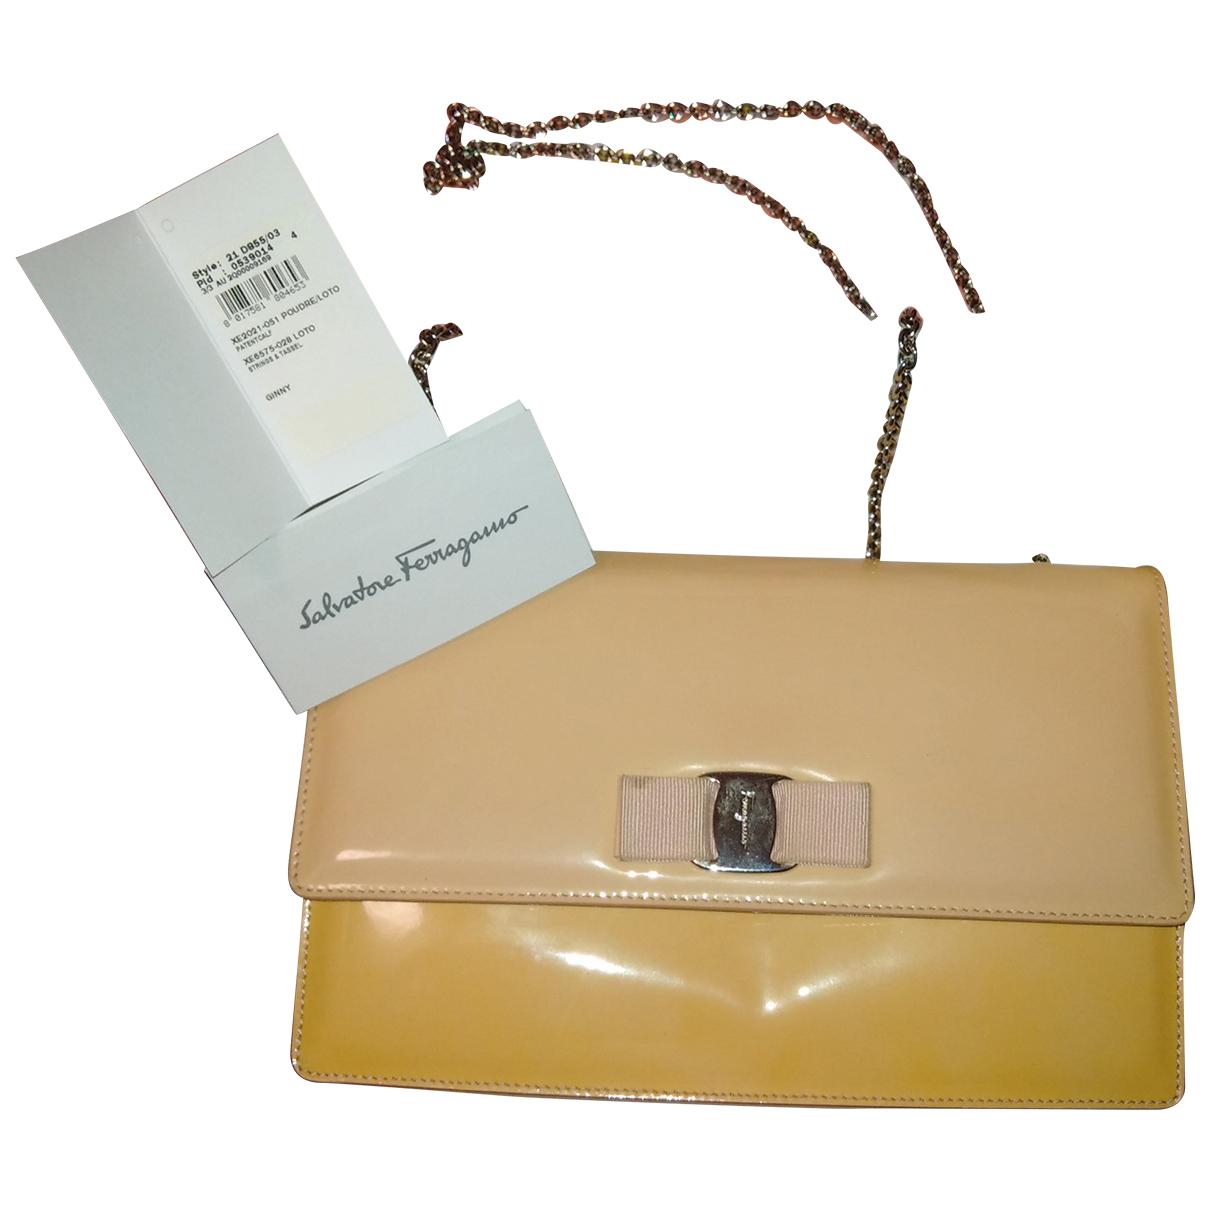 Salvatore Ferragamo Vara Beige Patent leather handbag for Women \N